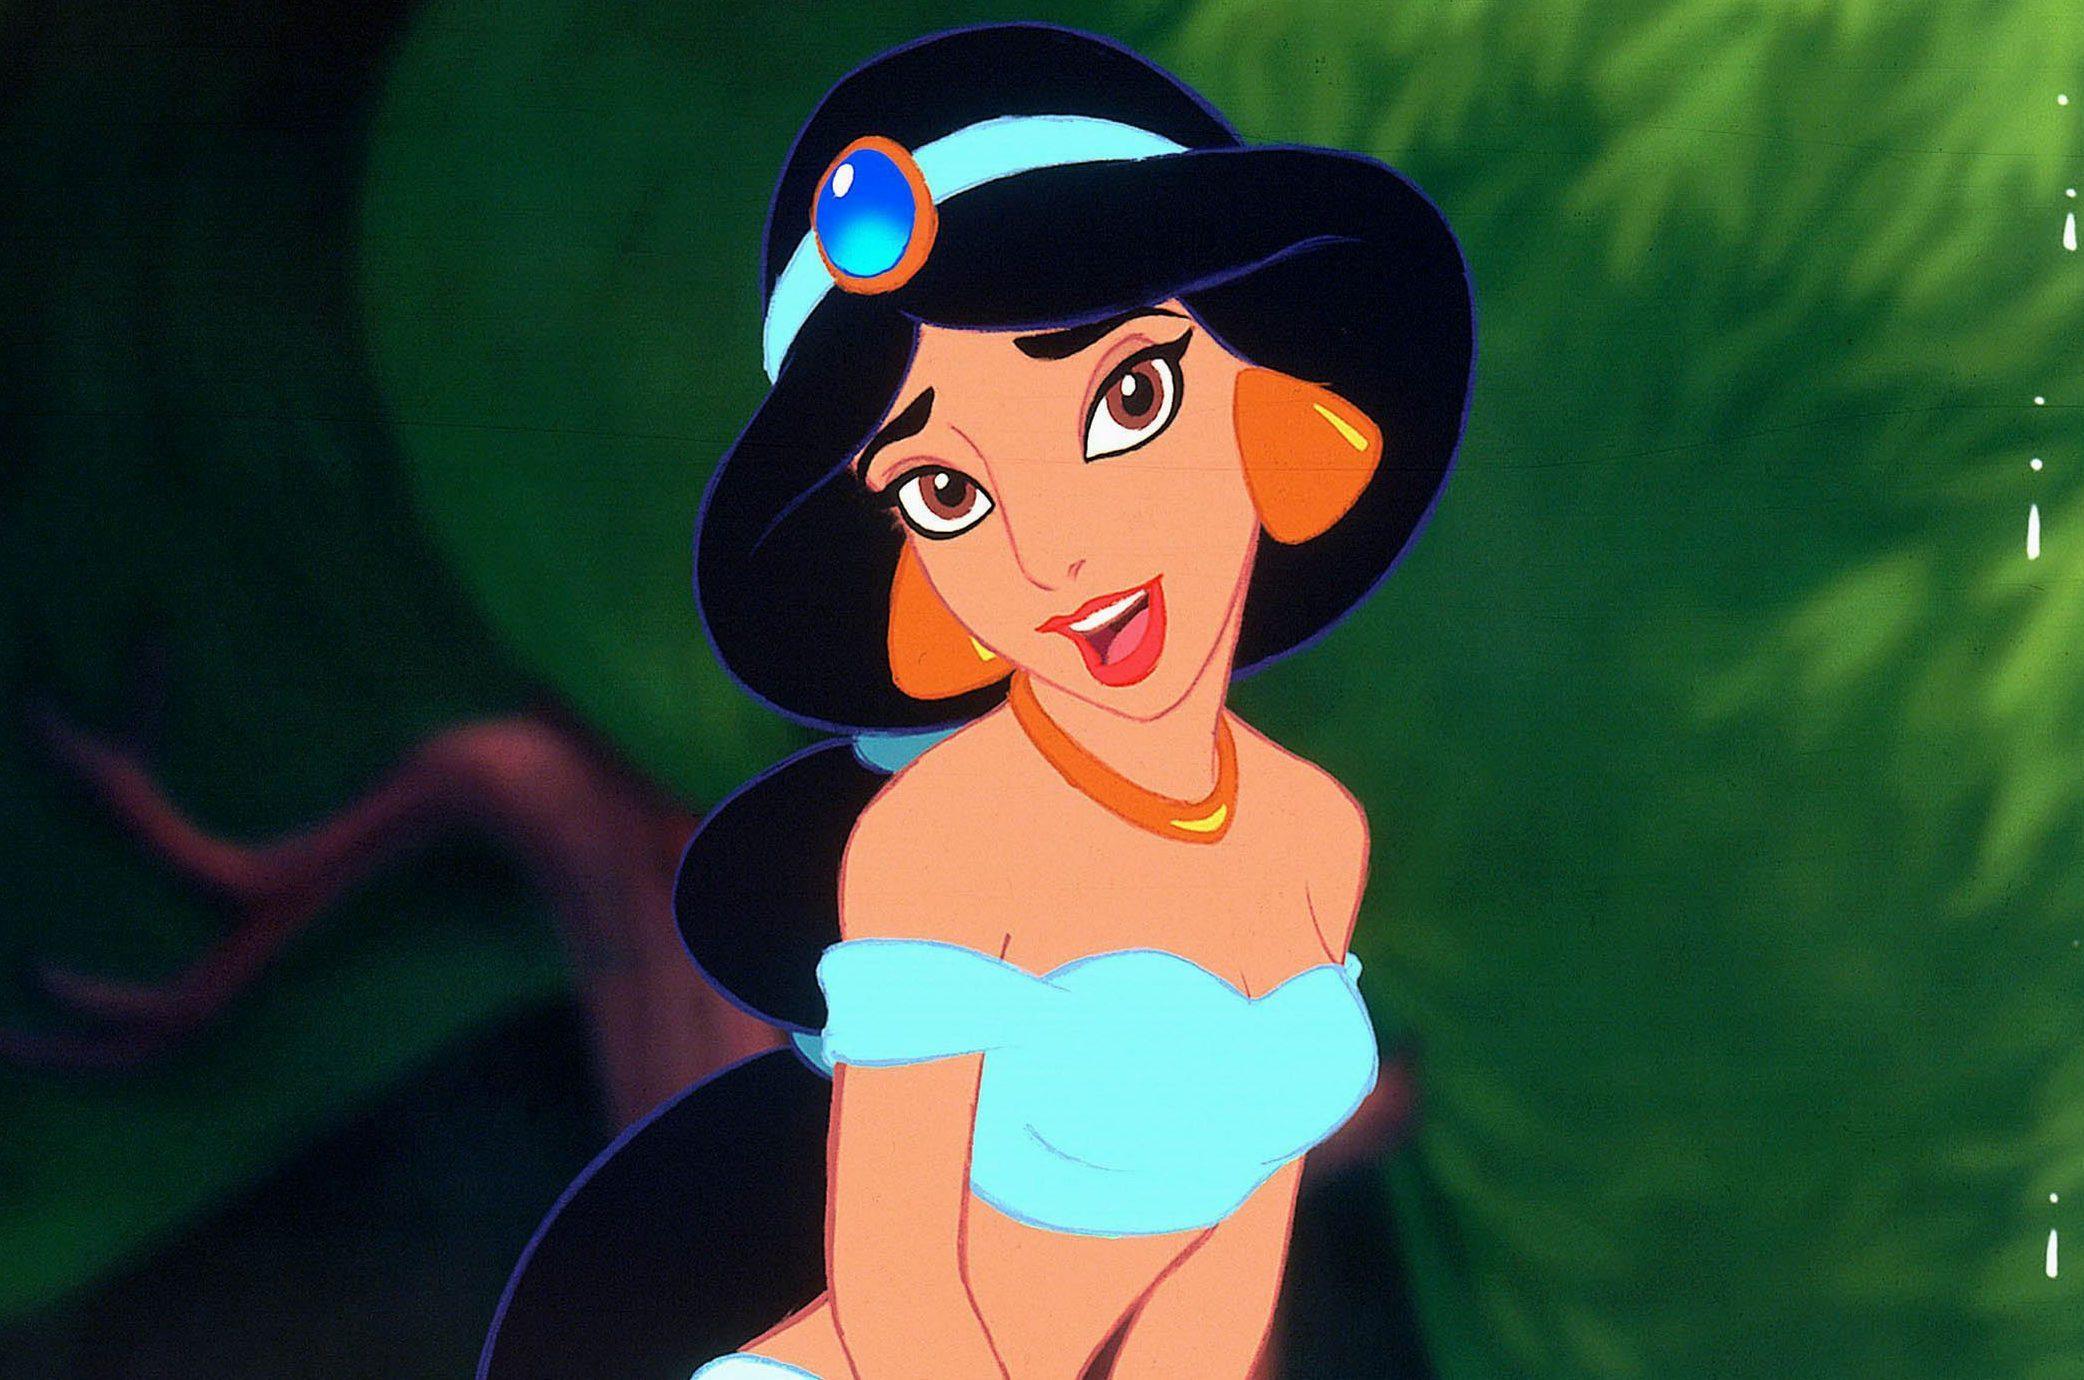 disney-princess-jasmine